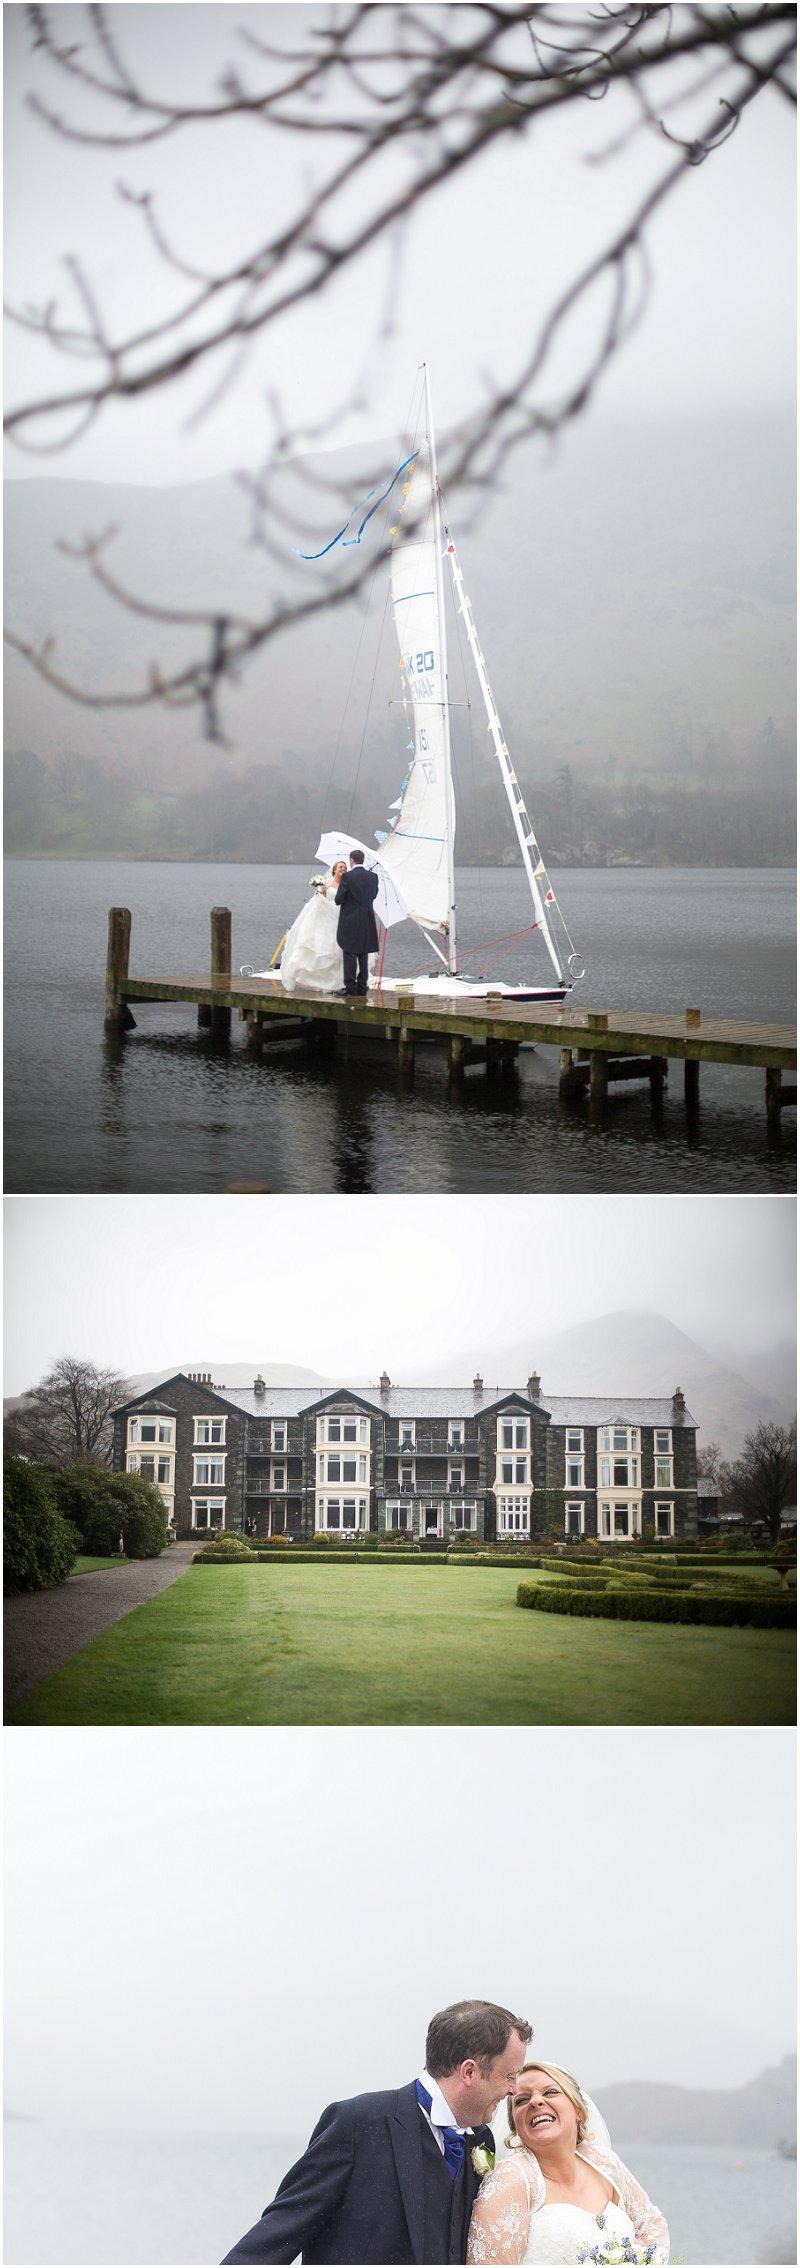 The Inn on the Lake Award Winning Wedding Photographer